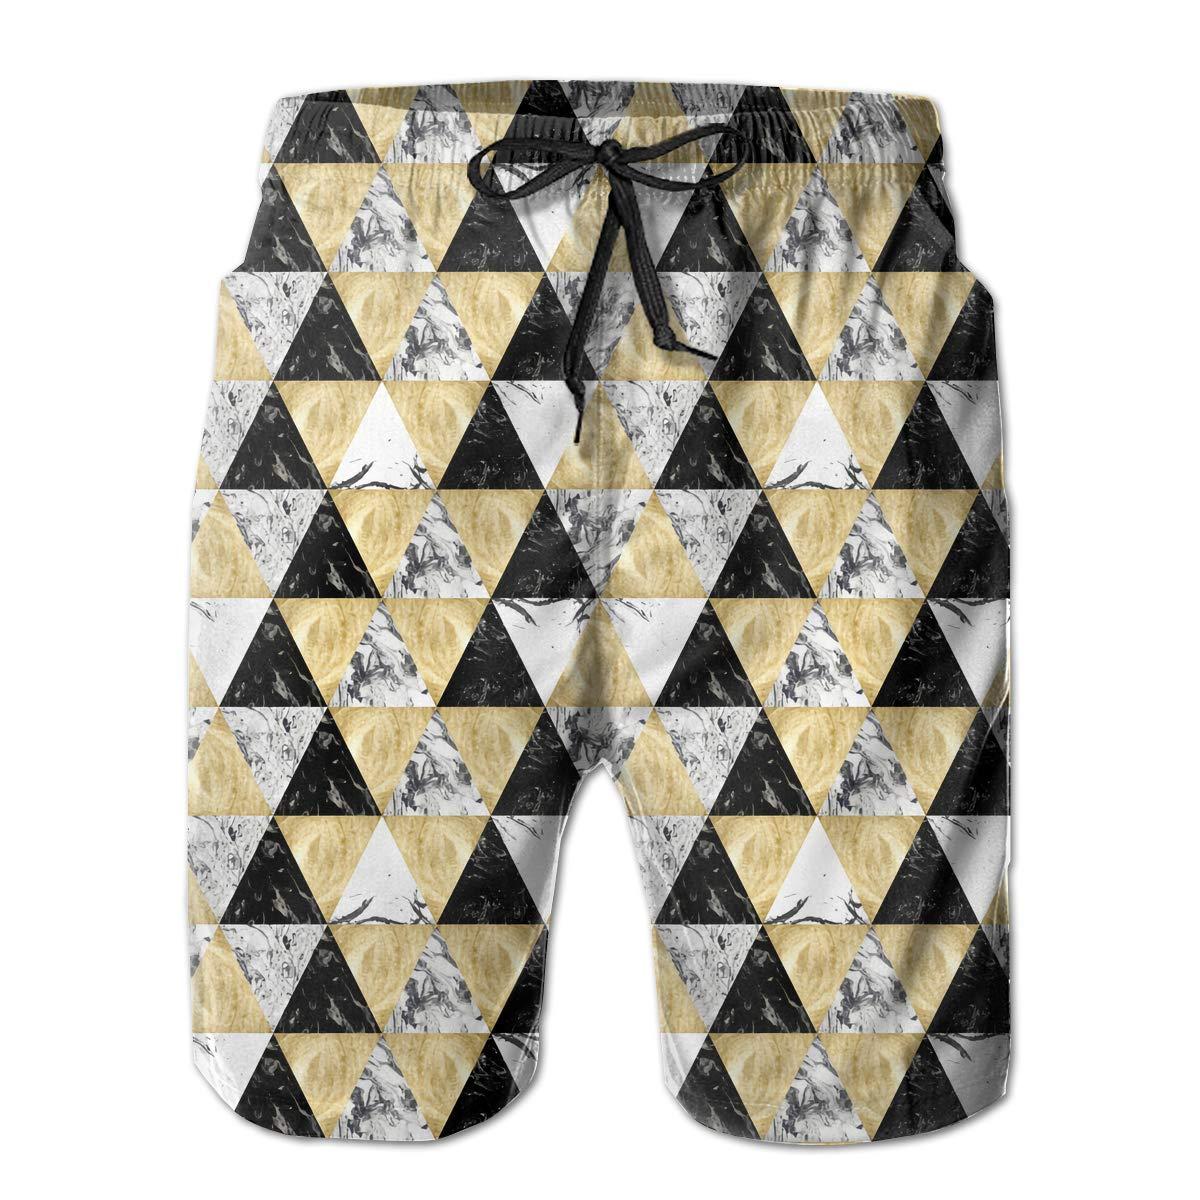 HFSST Pattern Stone Marble Yellow Black White Mens Swim Trunks Bathing Suit Shorts Board Beach